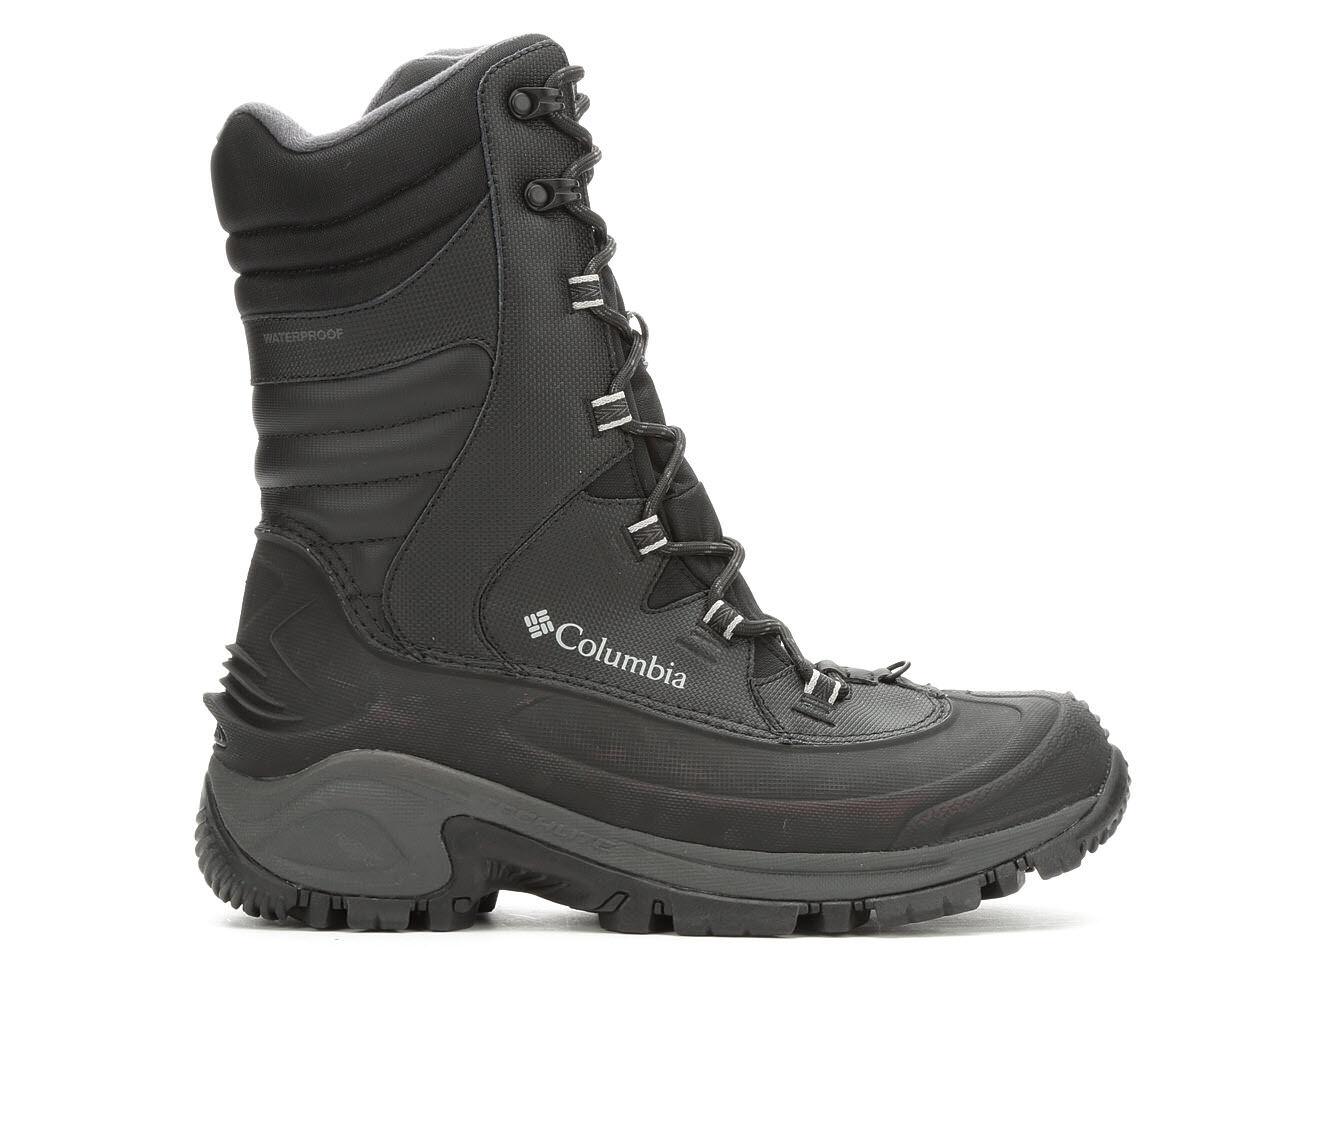 Men's Columbia Bugaboot III XTM Winter Boots Black/Charcoal